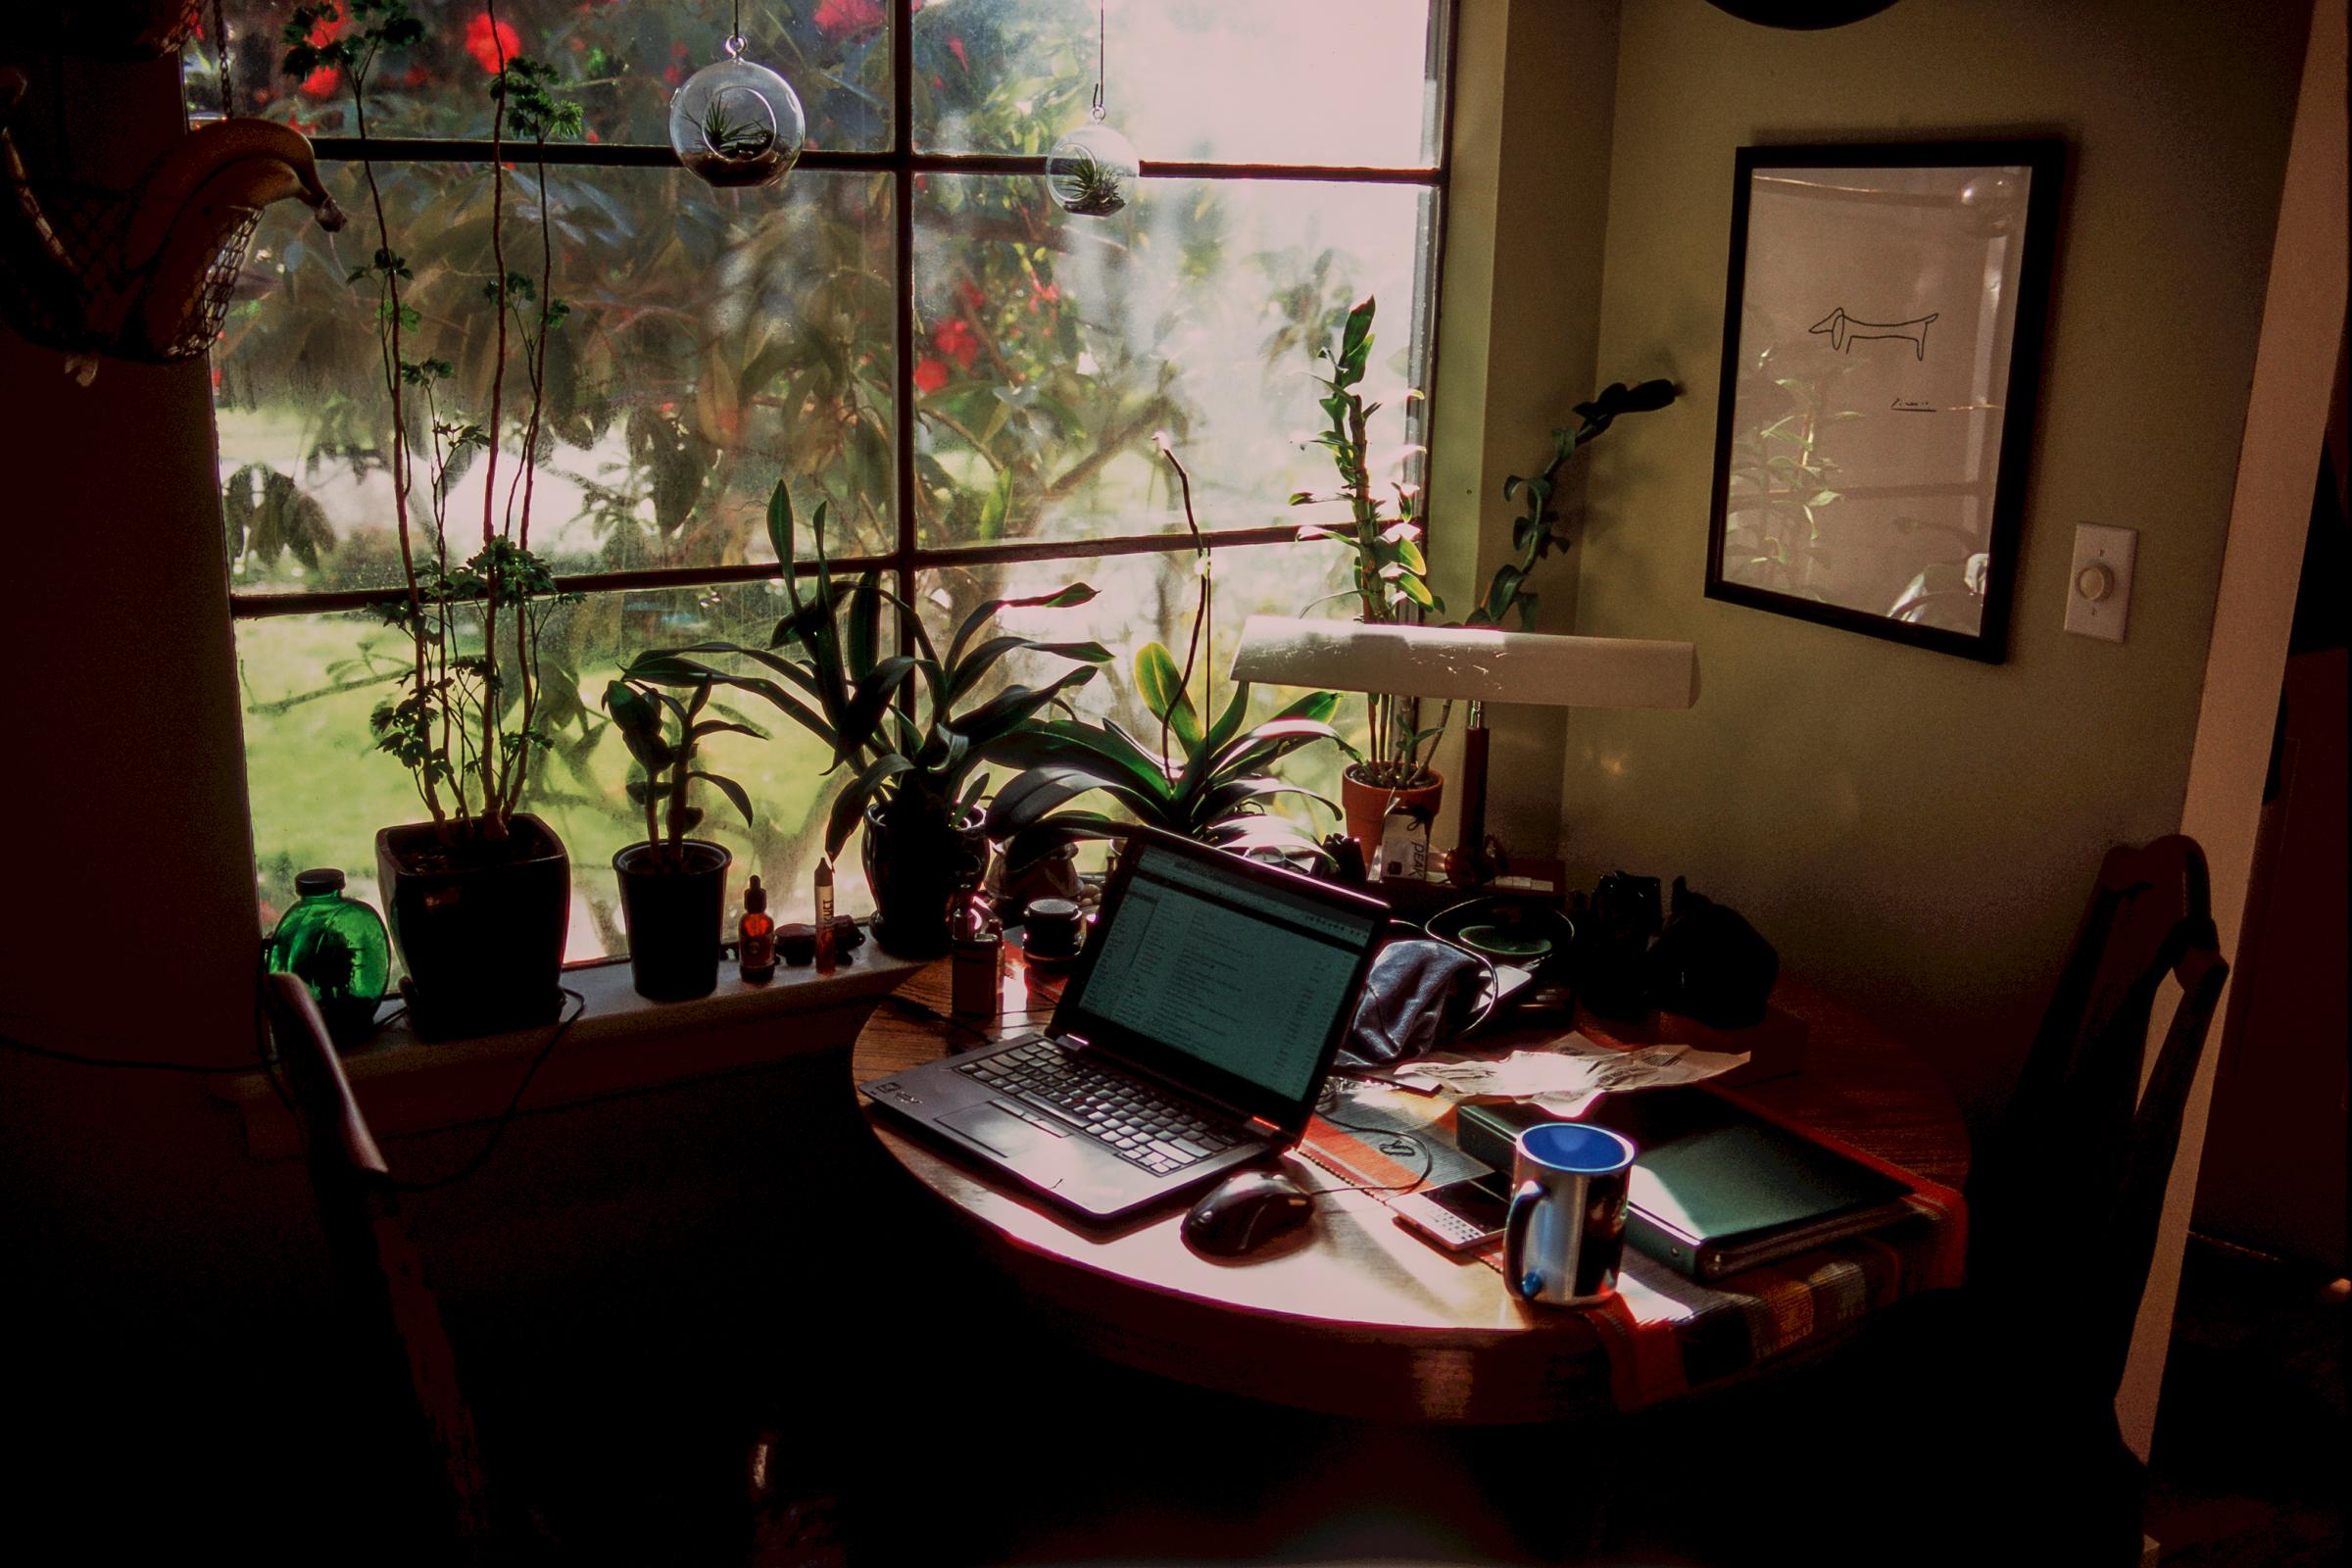 Kevin Rosinbum  | Light Office Hours | Pentax MZ-S | Velvia 100F